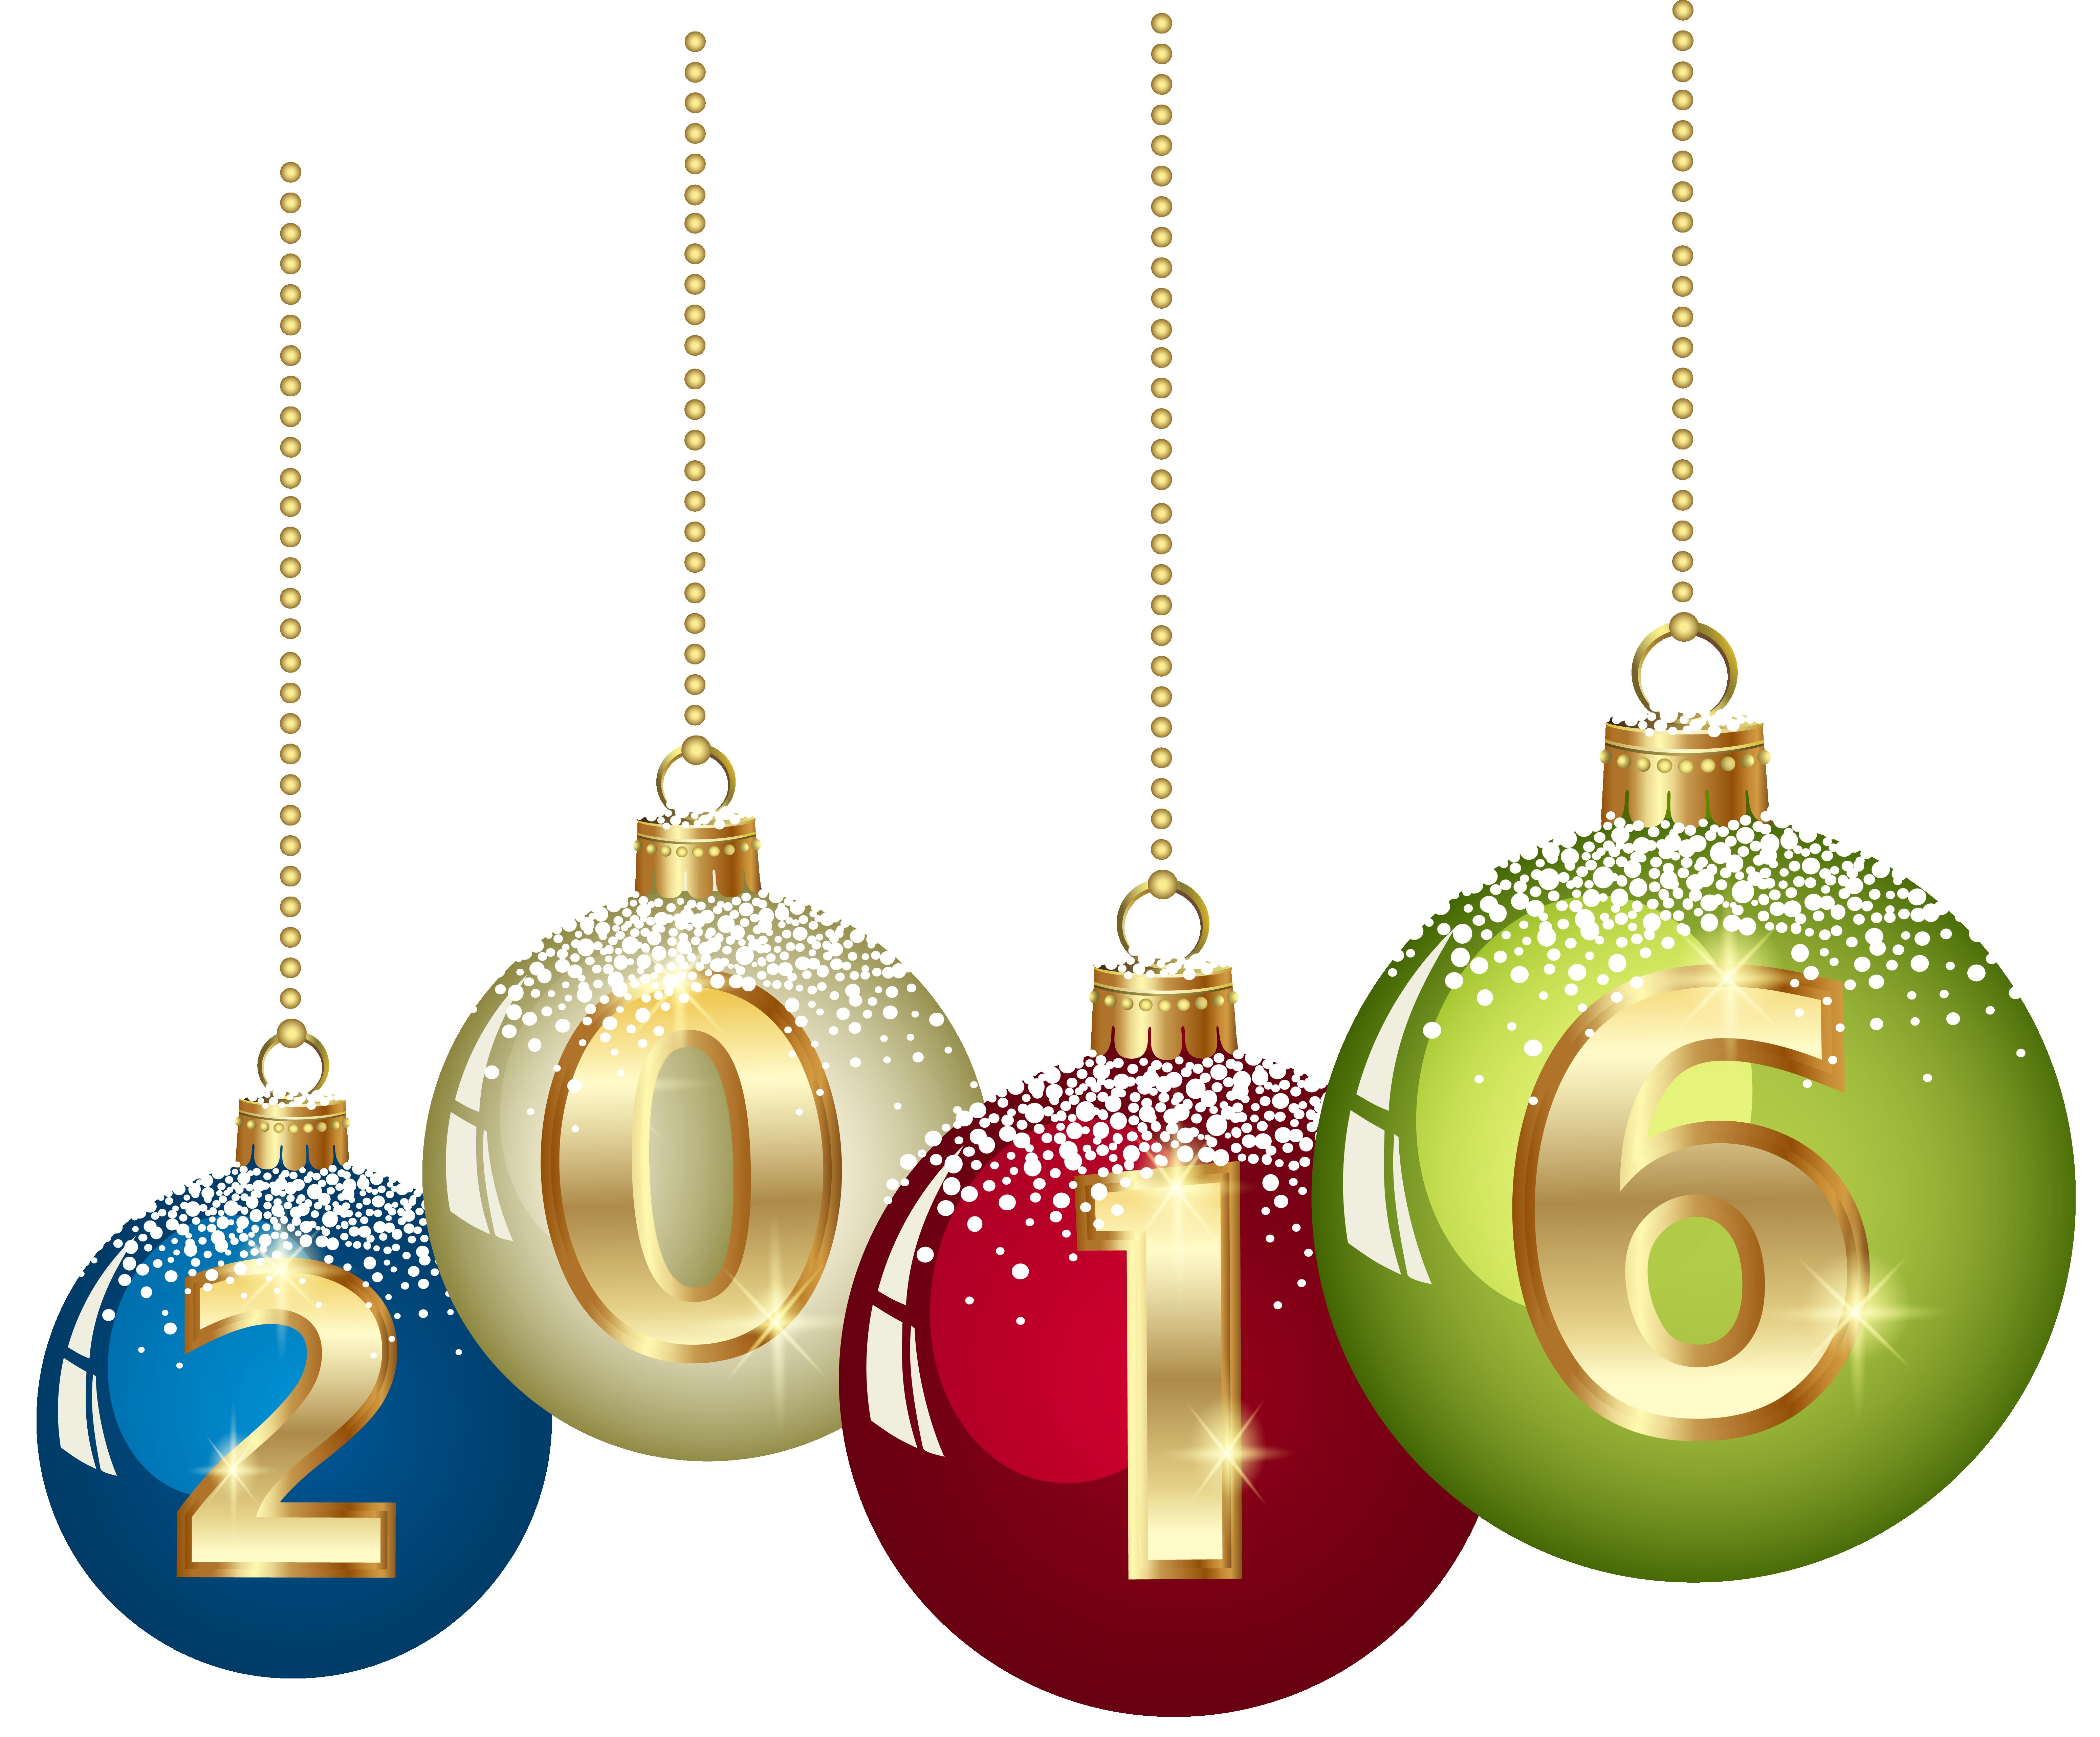 balls png image. 2016 clipart christmas